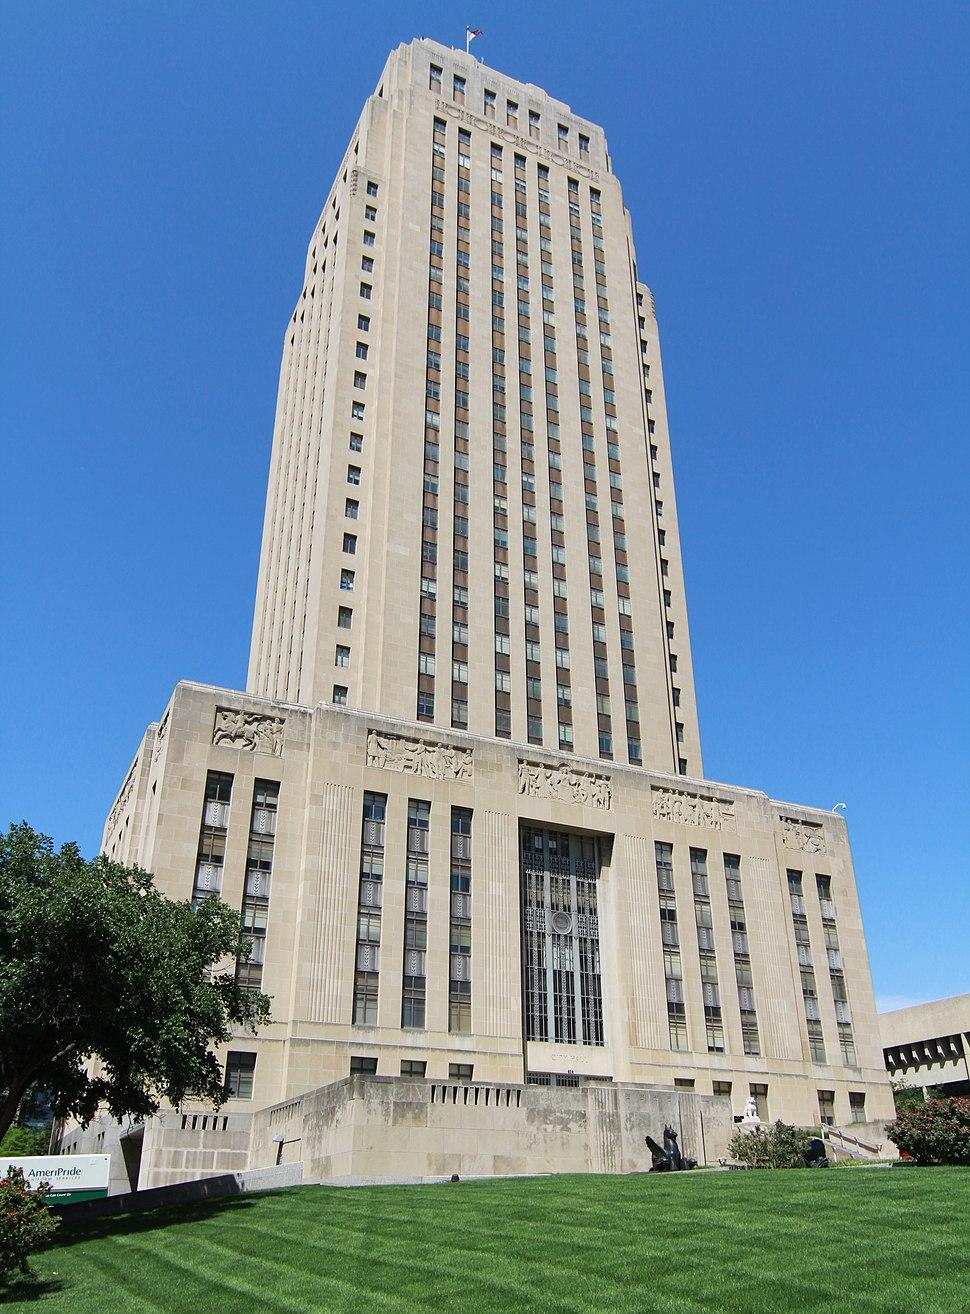 Kansas City Missouri City Hall